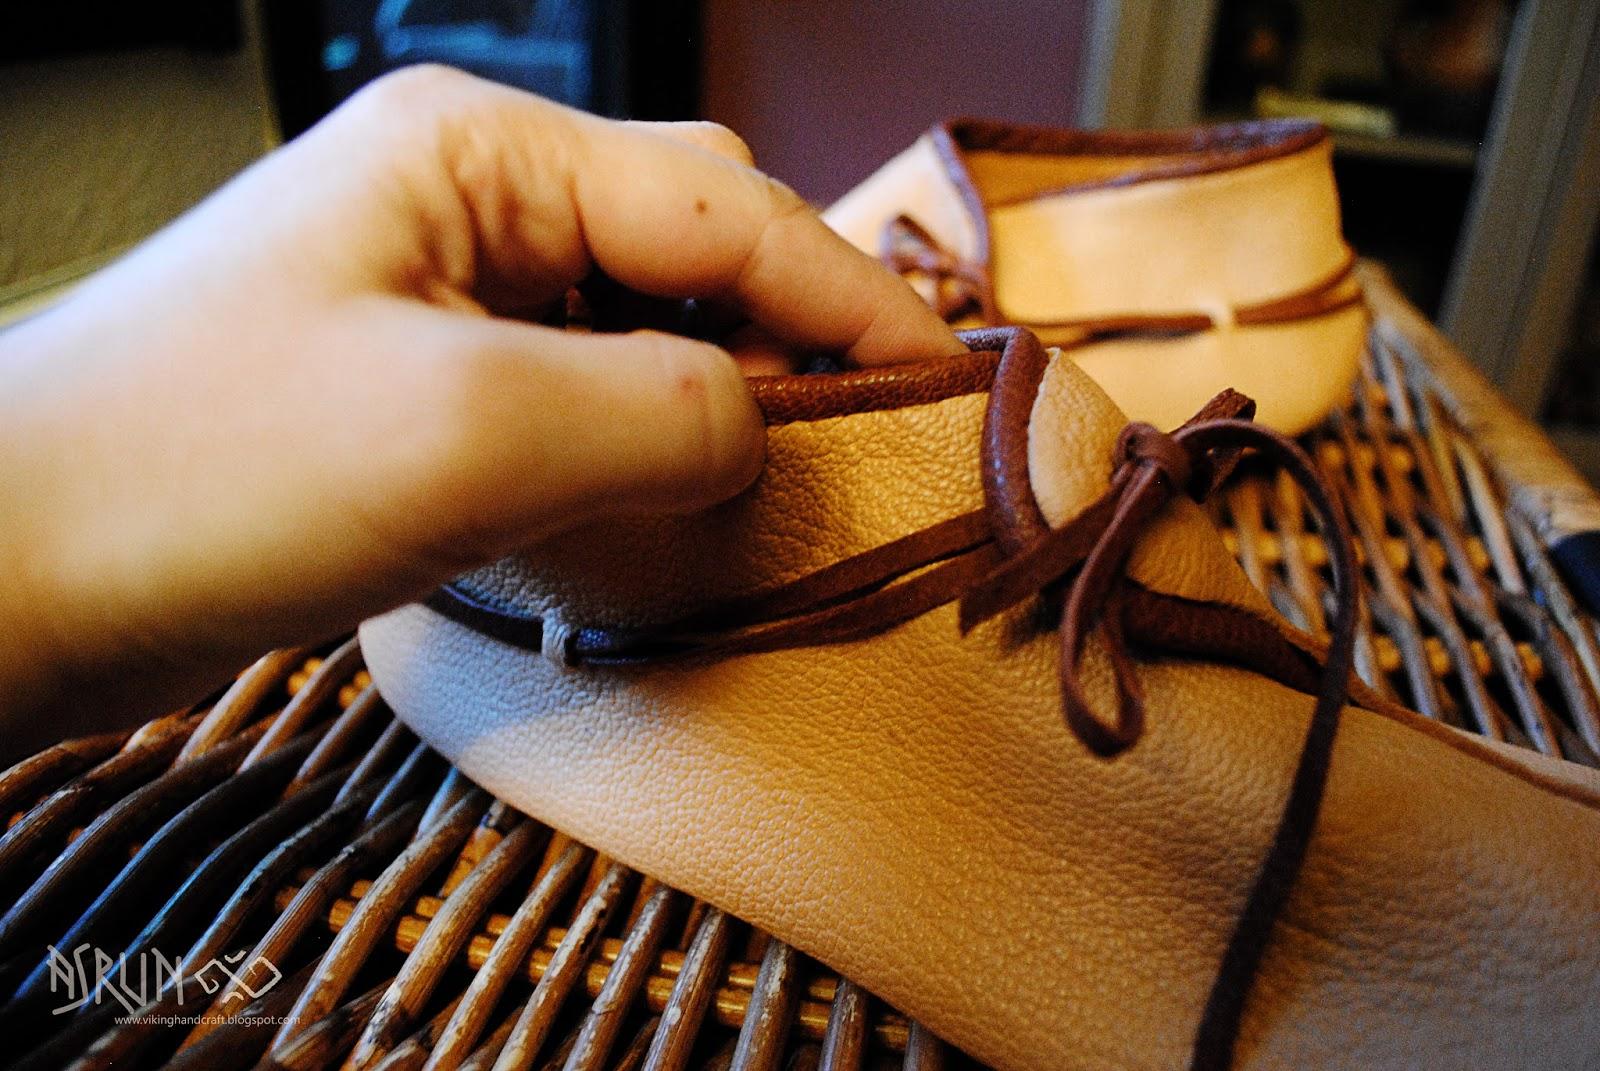 viking handcraft: Wendegenähte Schuhe (Haithabu)